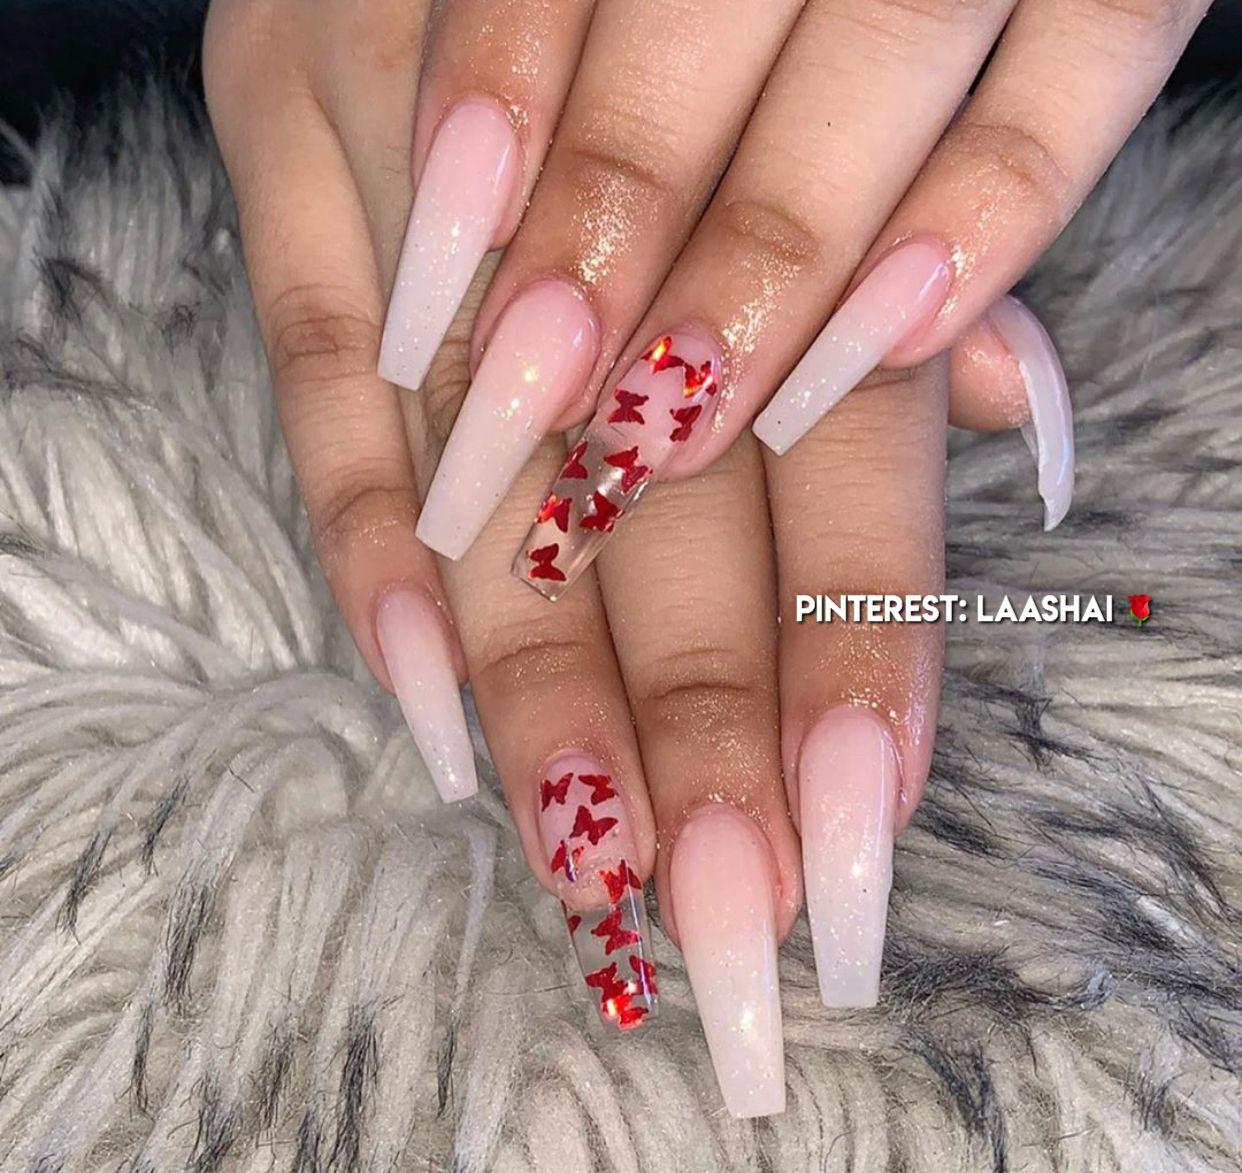 Pinterest Laashai Karens Magic Nails Long Acrylic Nails Coffin Clear Acrylic Nails Red Acrylic Nails